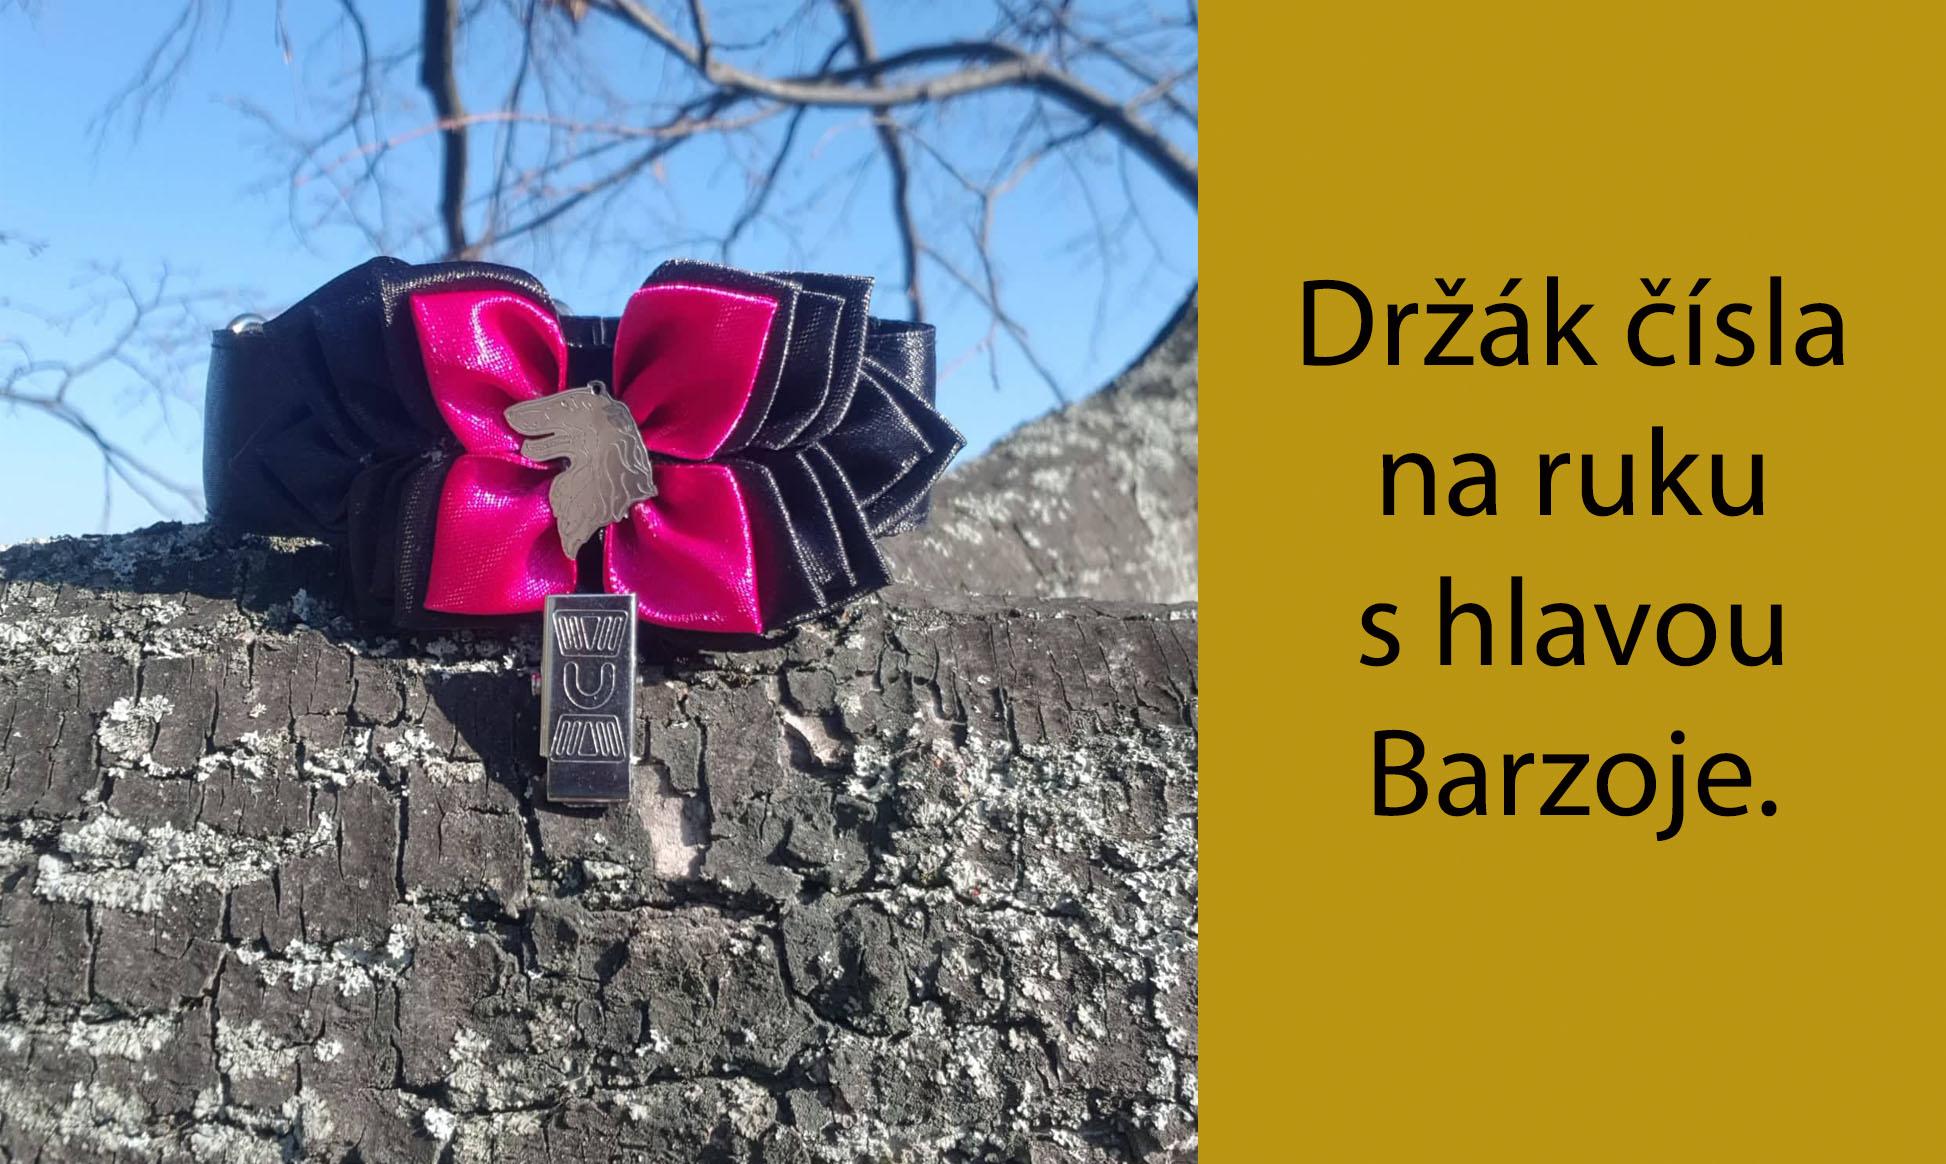 ANH Barzoj